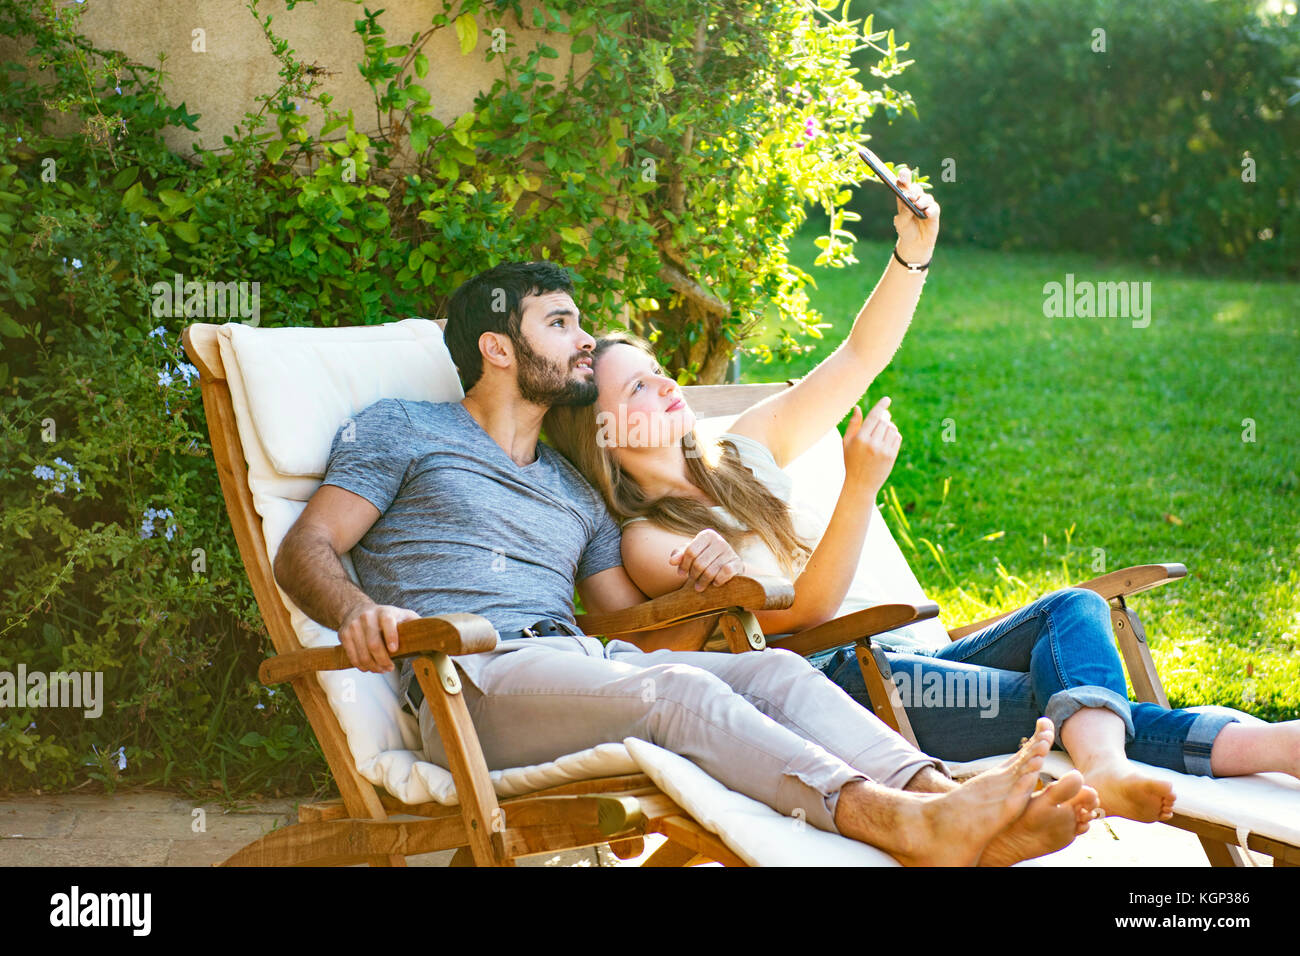 Young couple taking selfies - Stock Image